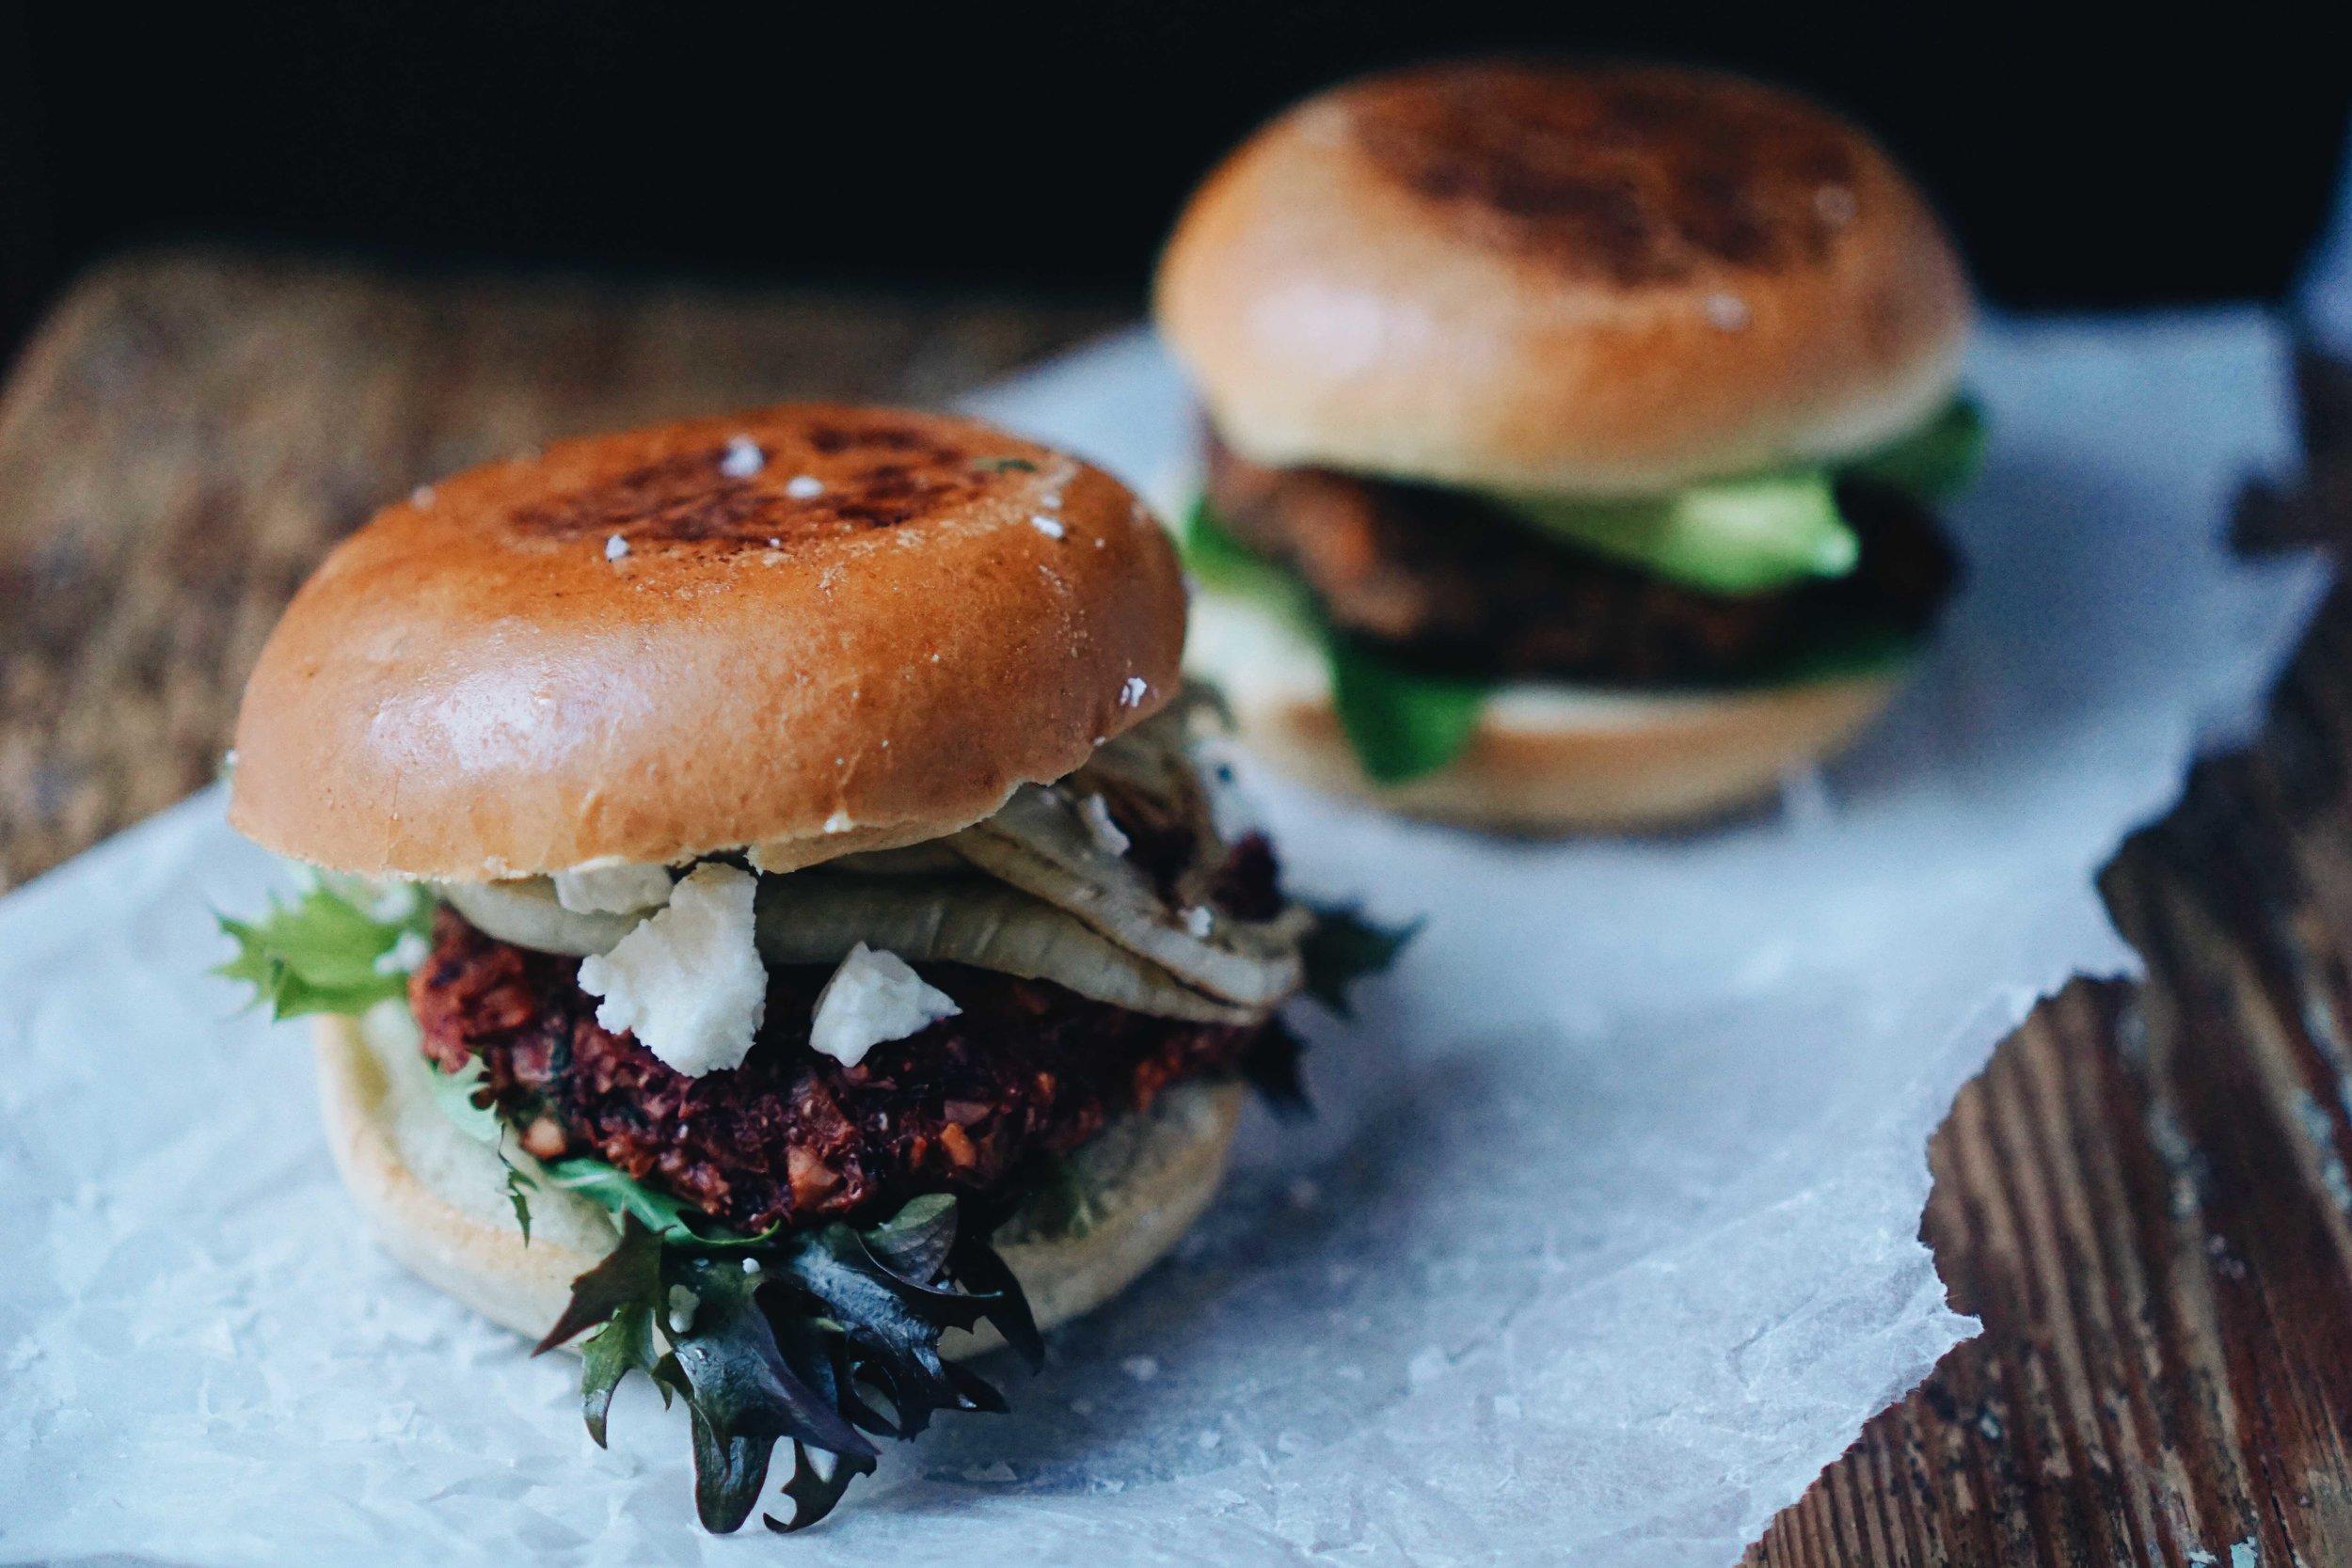 Vegetarian burger on the left, vegan on the right